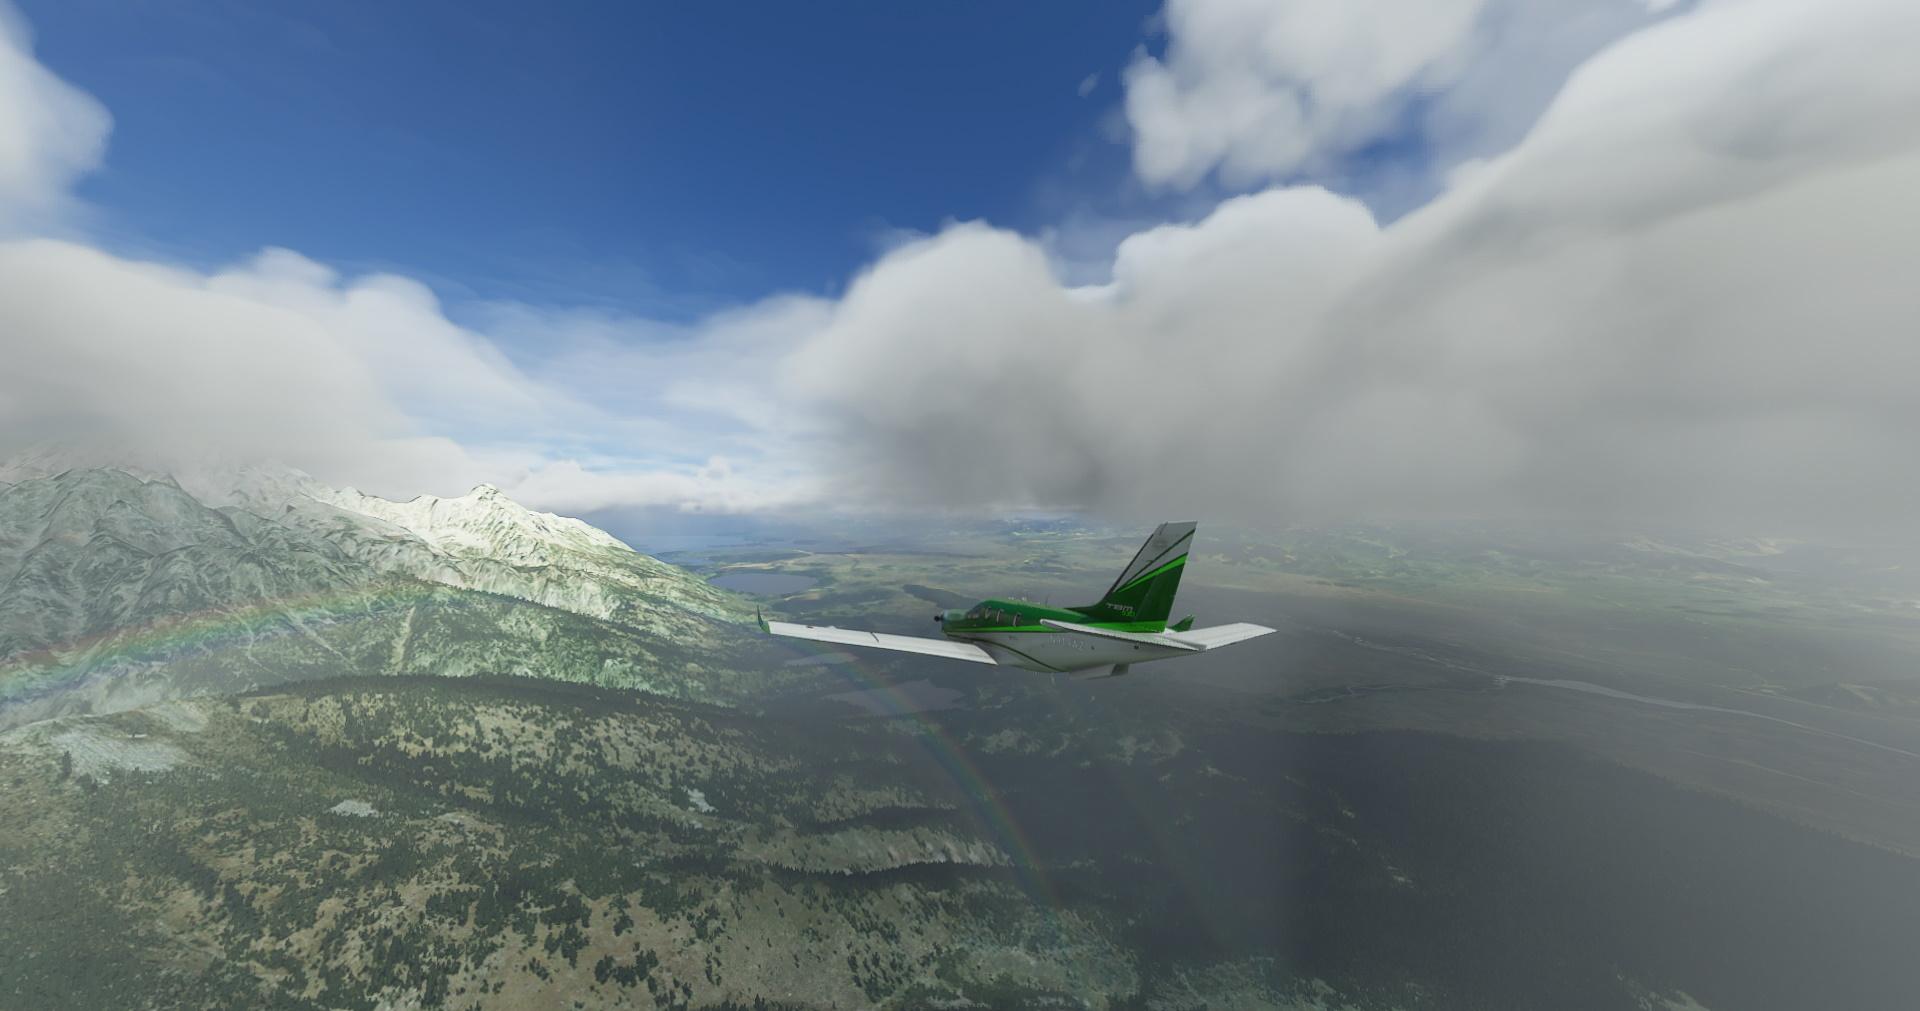 Microsoft Flight Simulator Tbm Rainbow Mountains